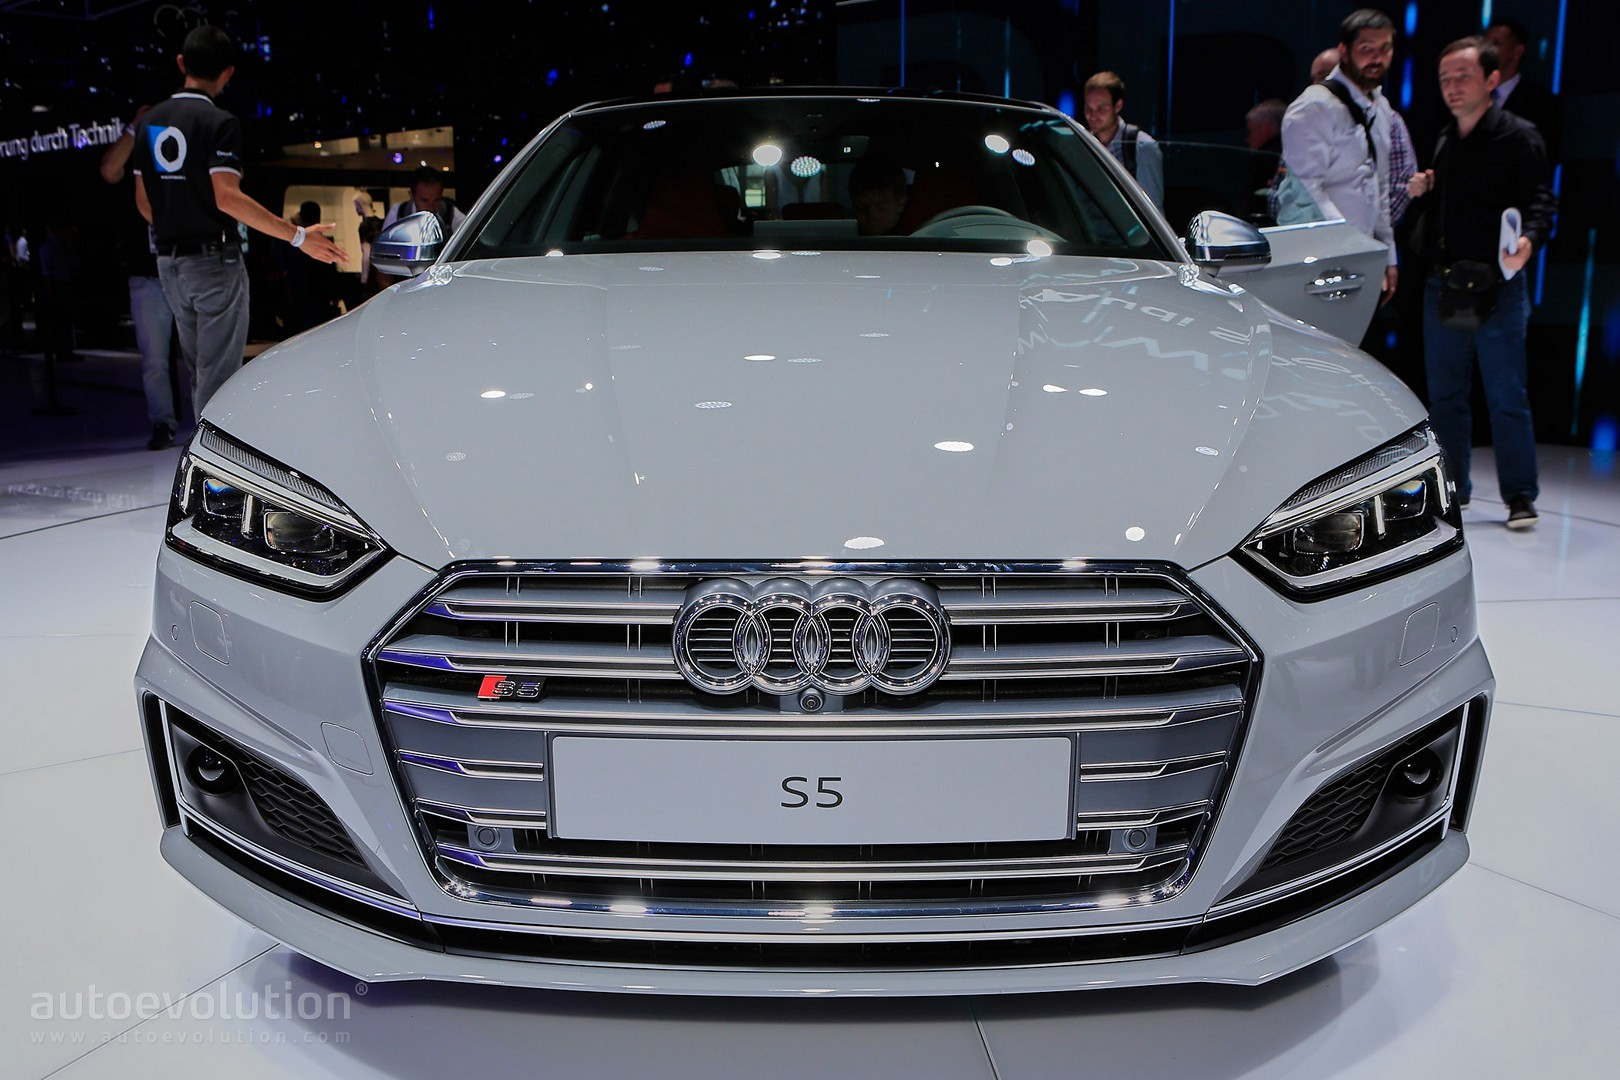 Audi S5 Colors 2017 Audi S5 Sportback Looks Like A Shark